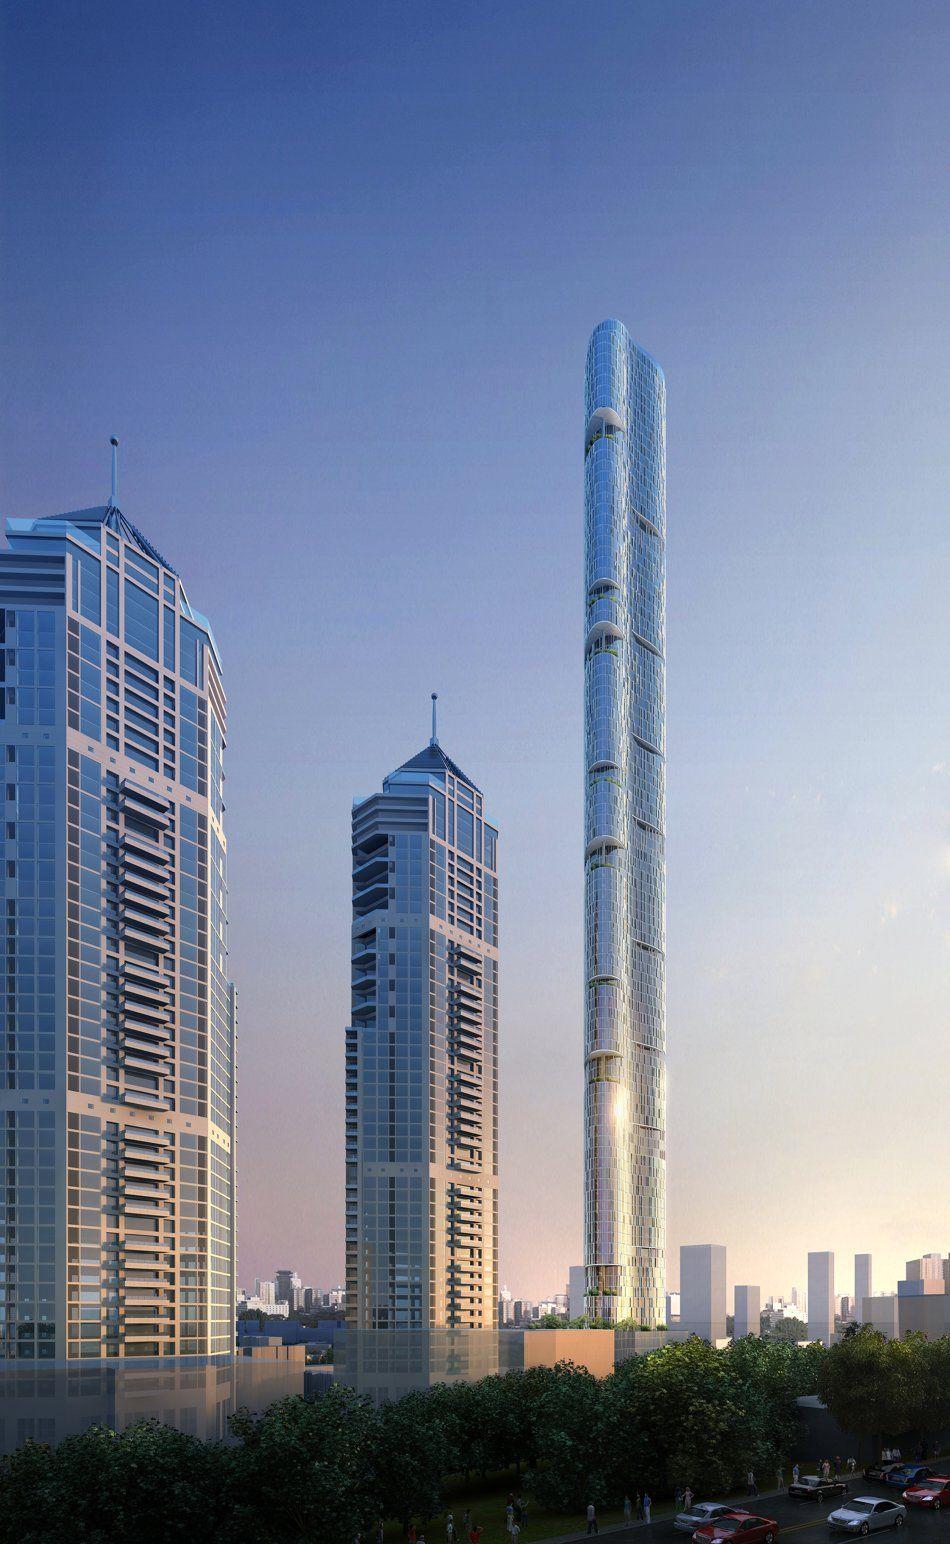 Almost Mumbai's Tallest Tower